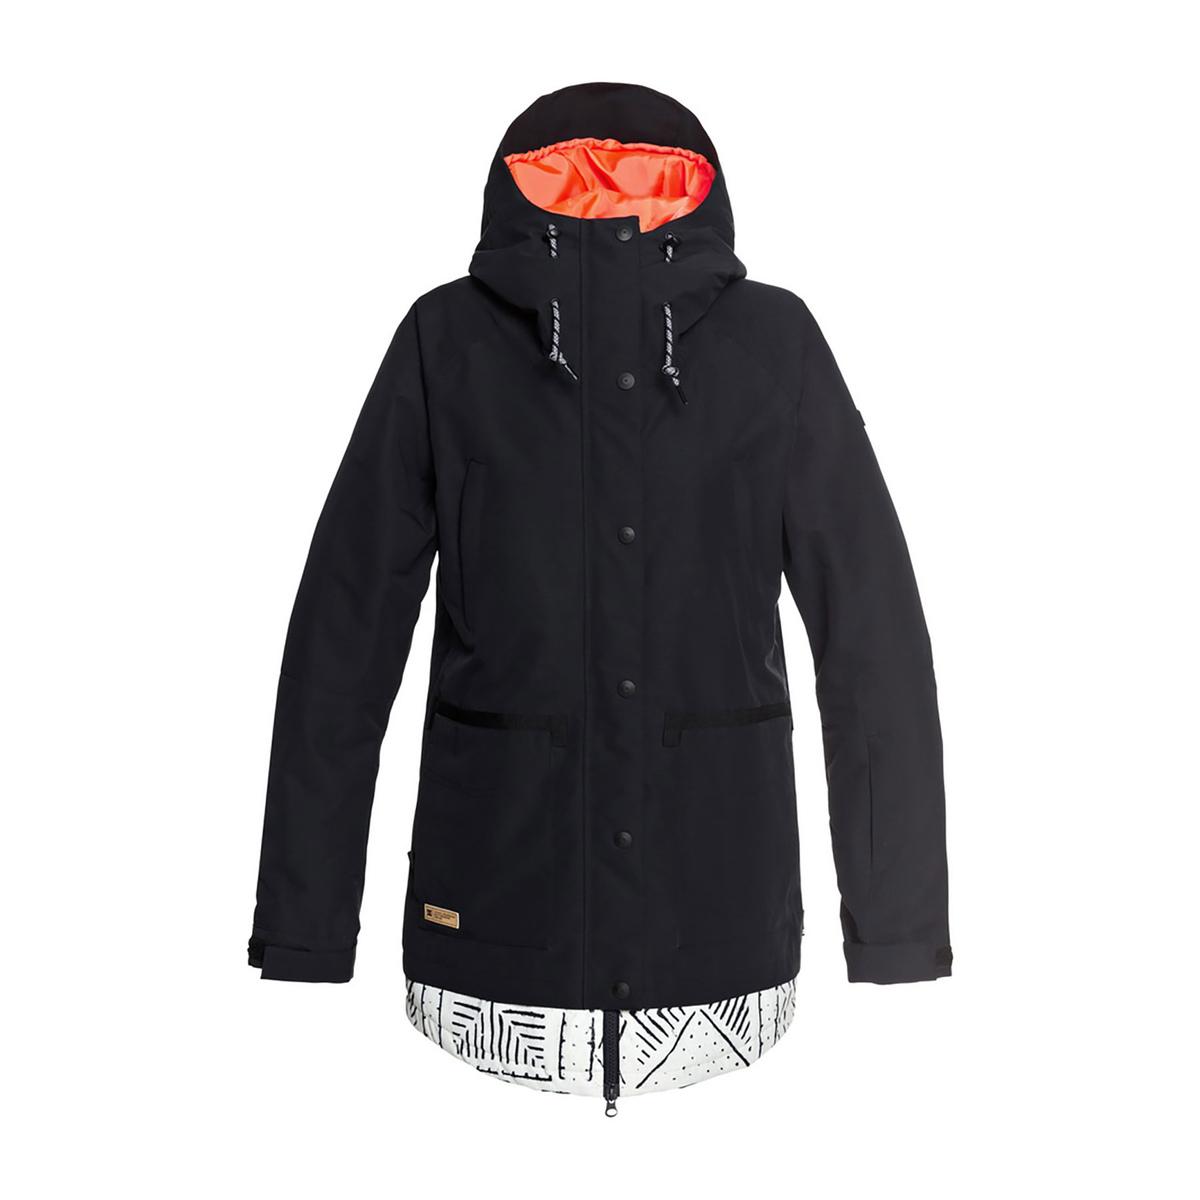 Prezzi Dc shoes giacca riji donna